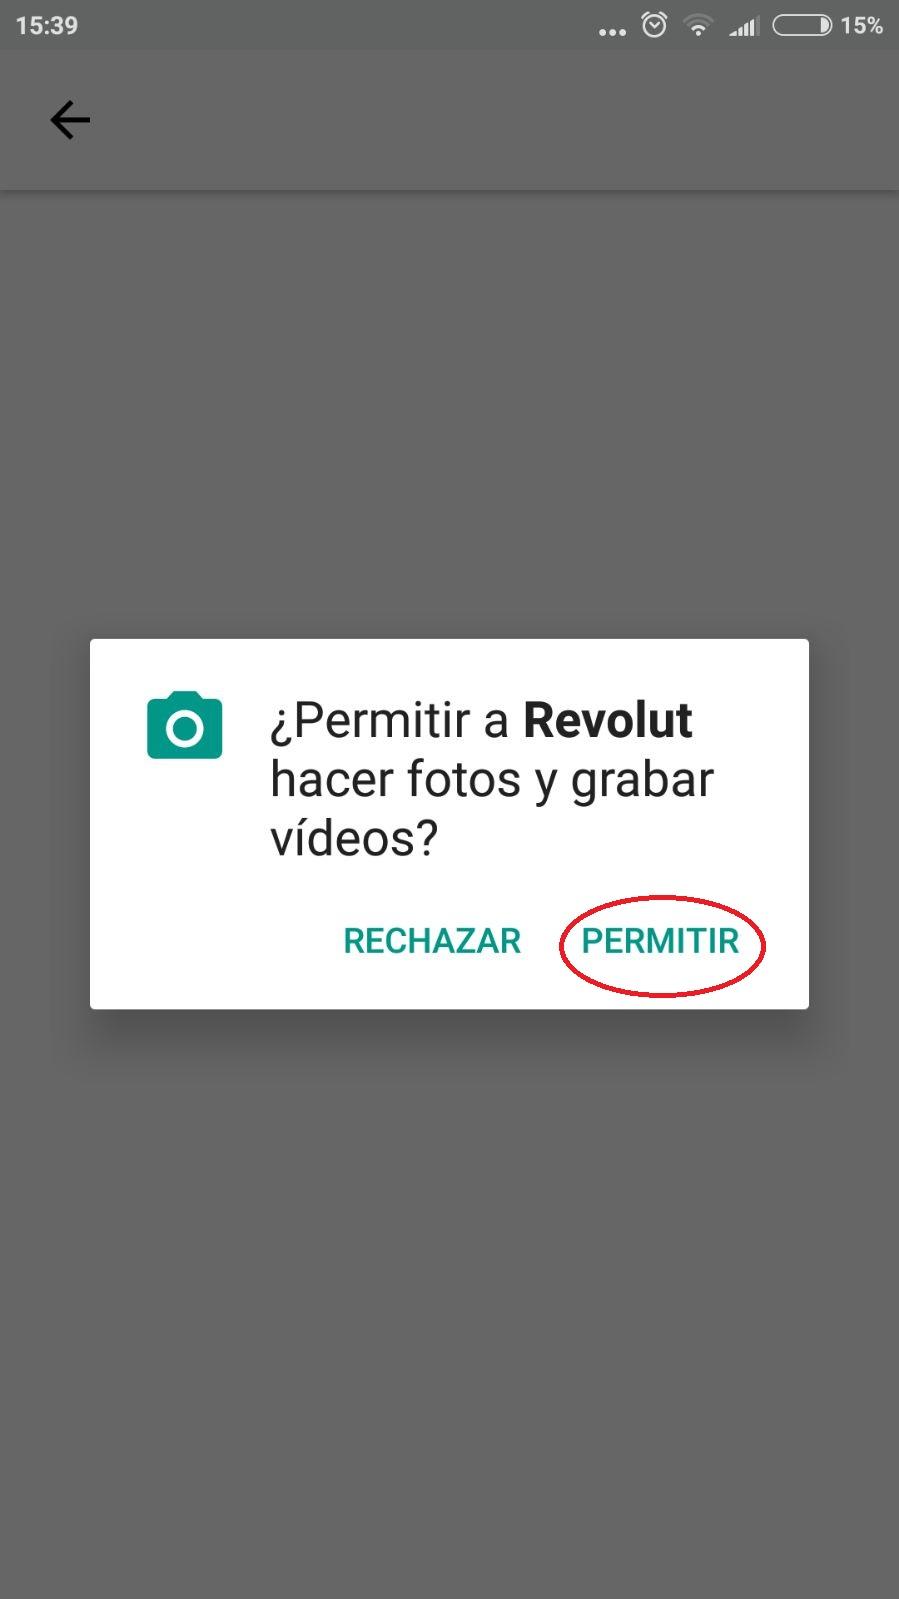 Img post cómo funciona REVOLUT. Registrate paso a paso 23